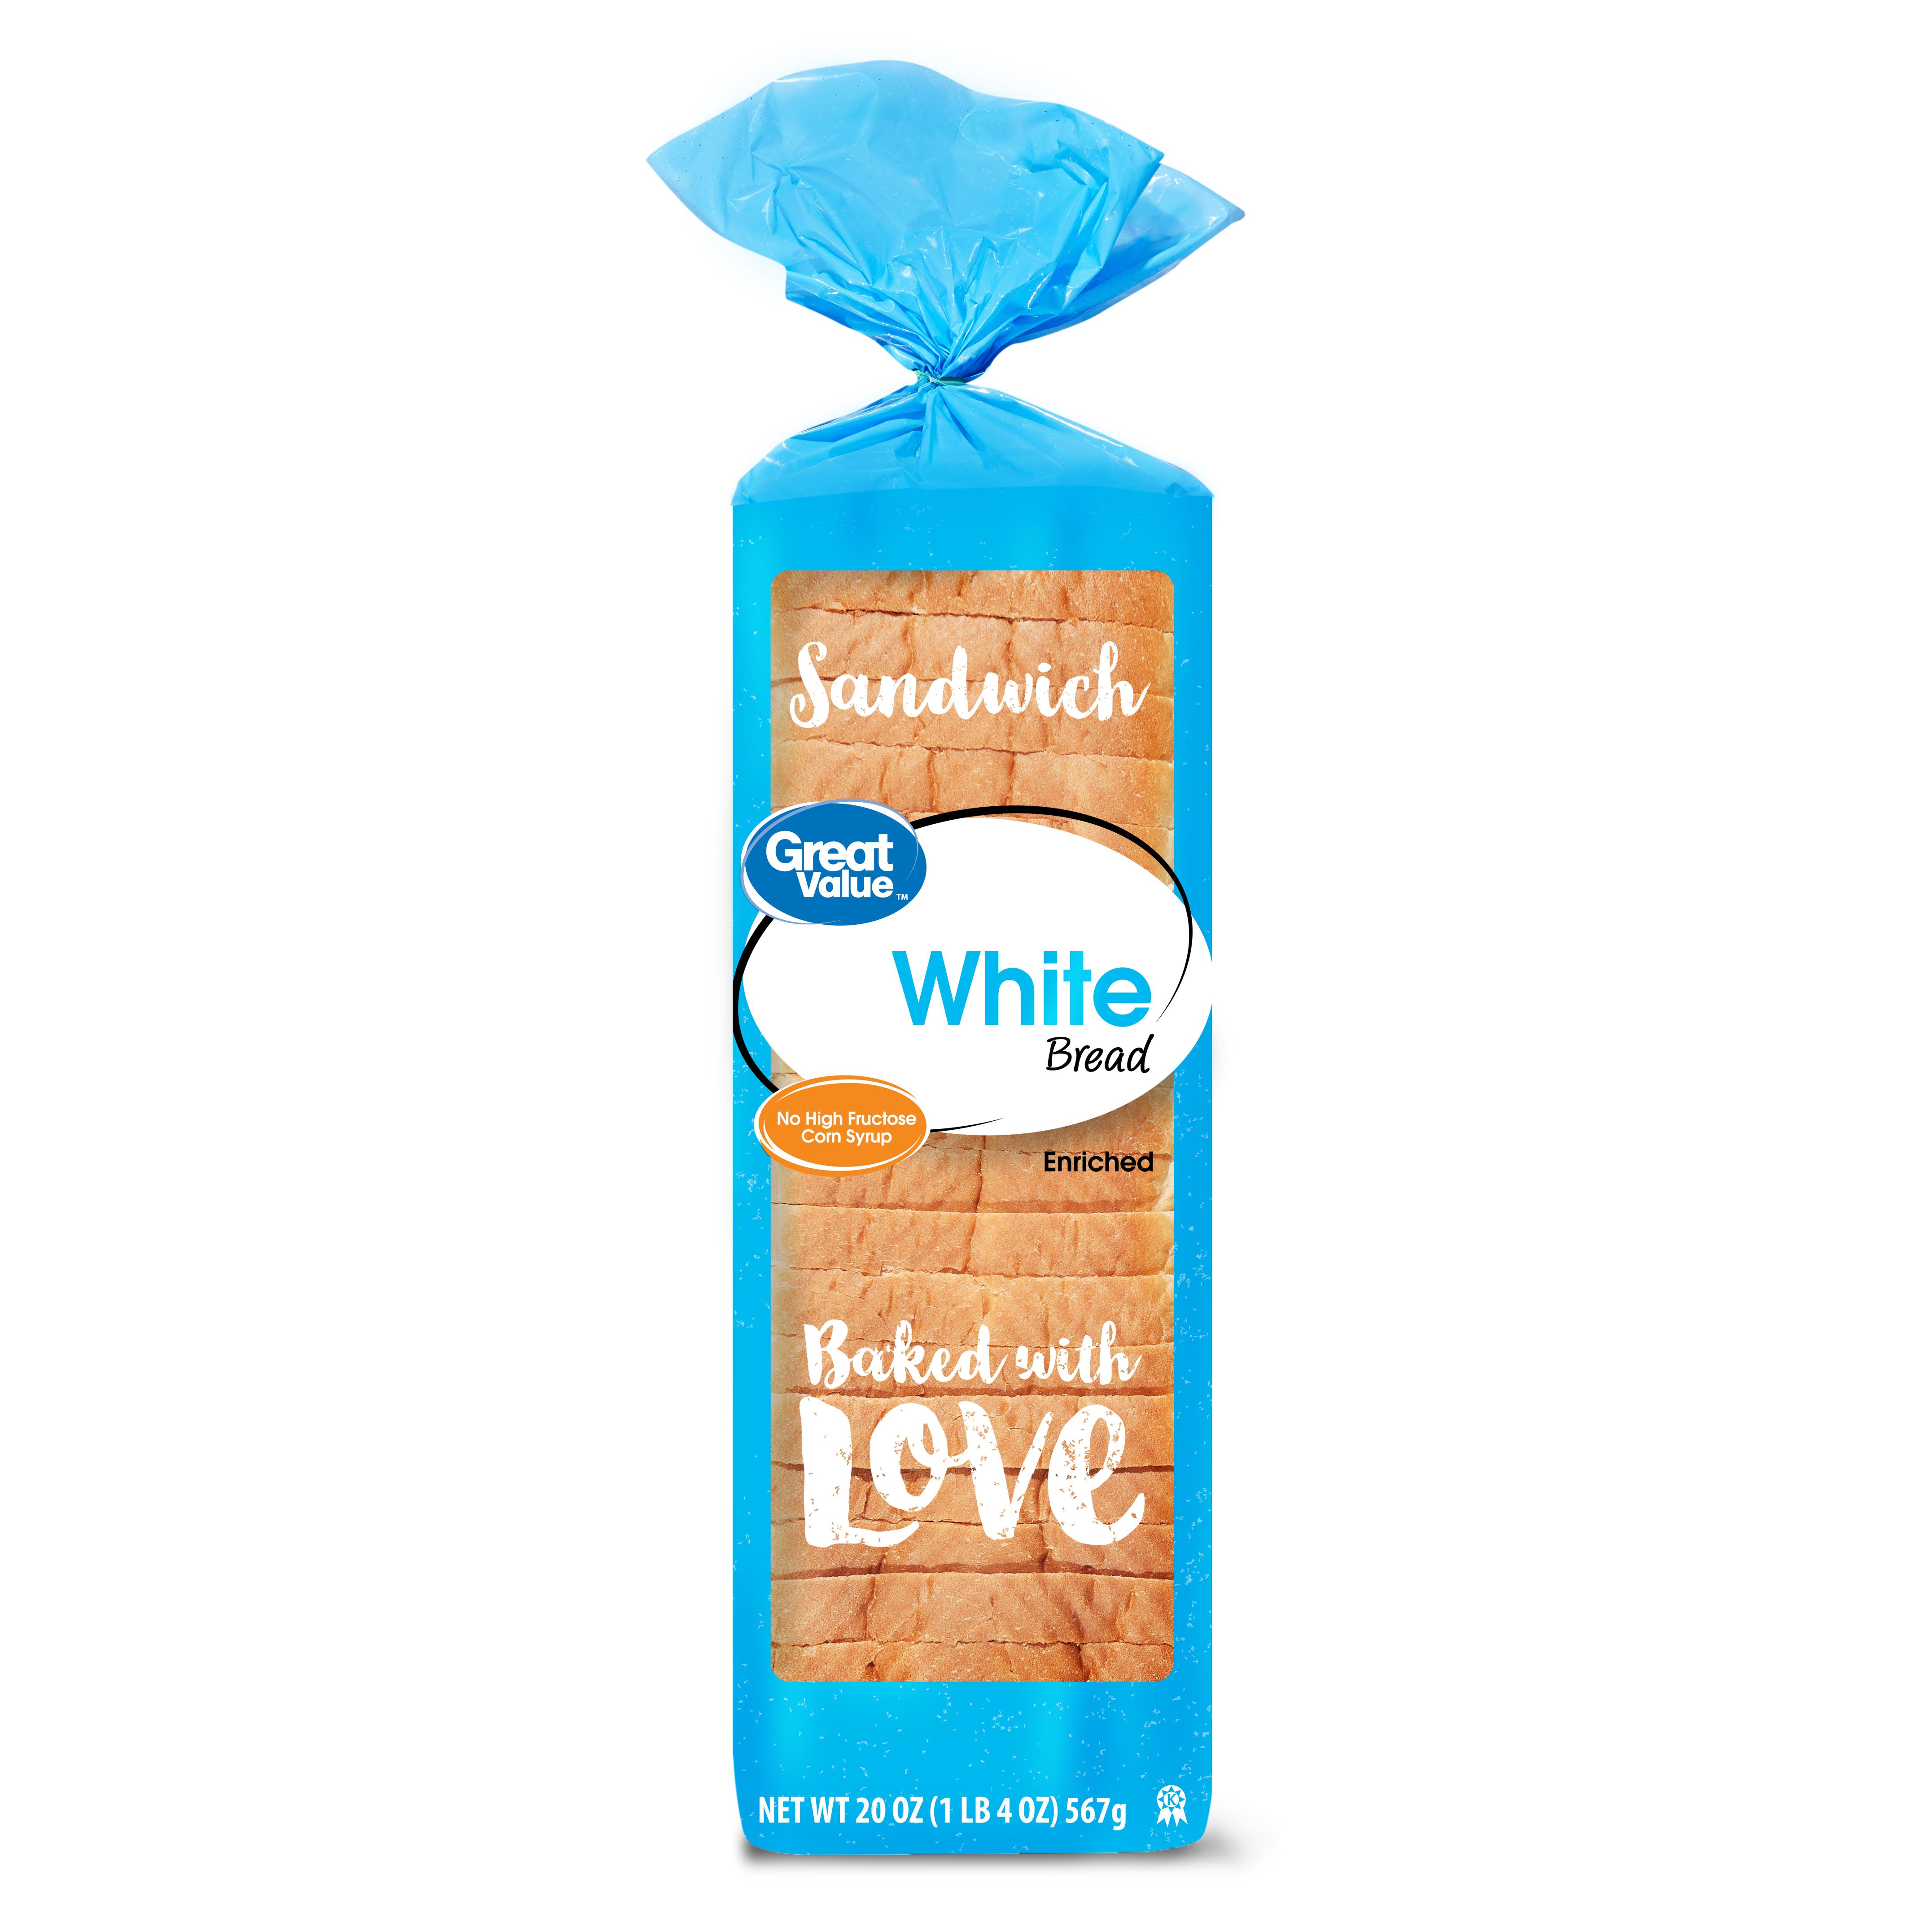 Great Value White Bread, Round Top, 20 oz